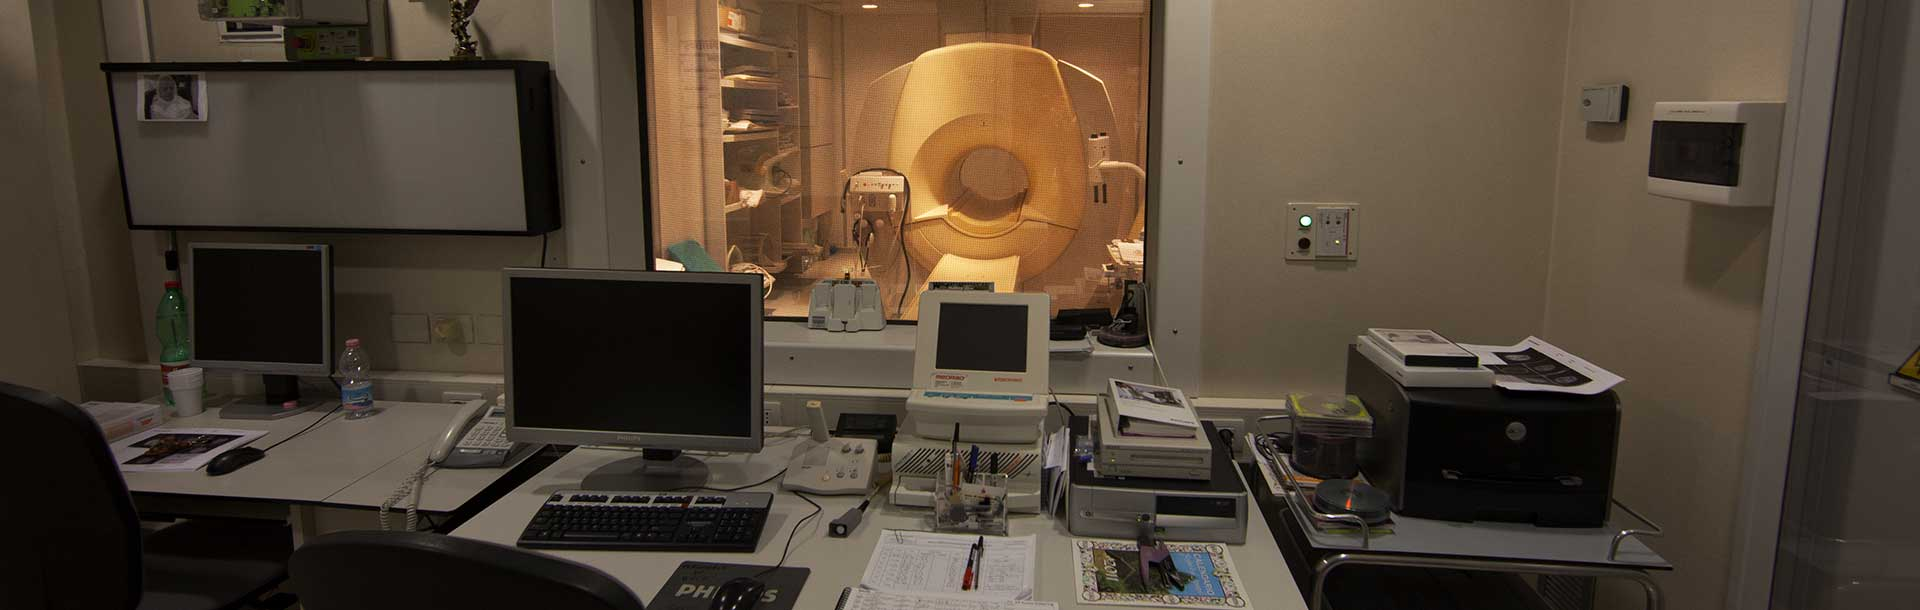 resonancia magnética clínica de próstata multiparamétrica villa stabia